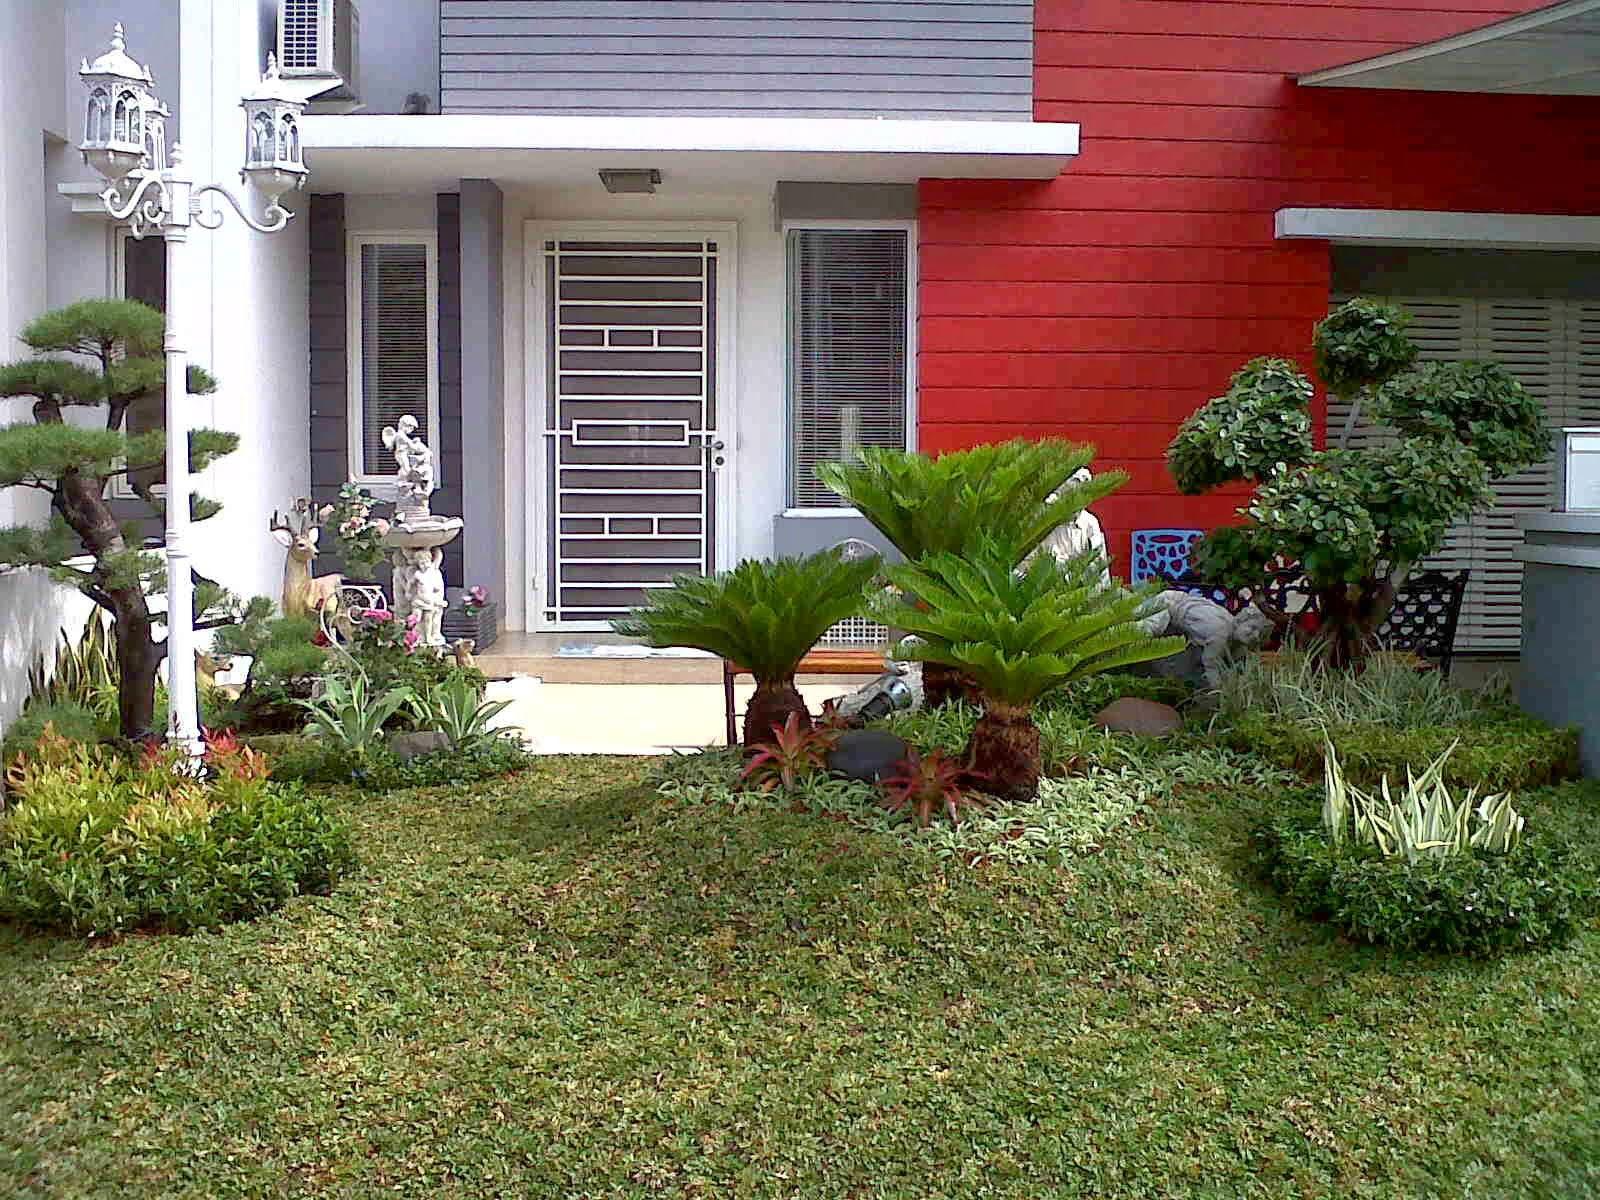 Design-Japanese-Garden-House-Minimalist